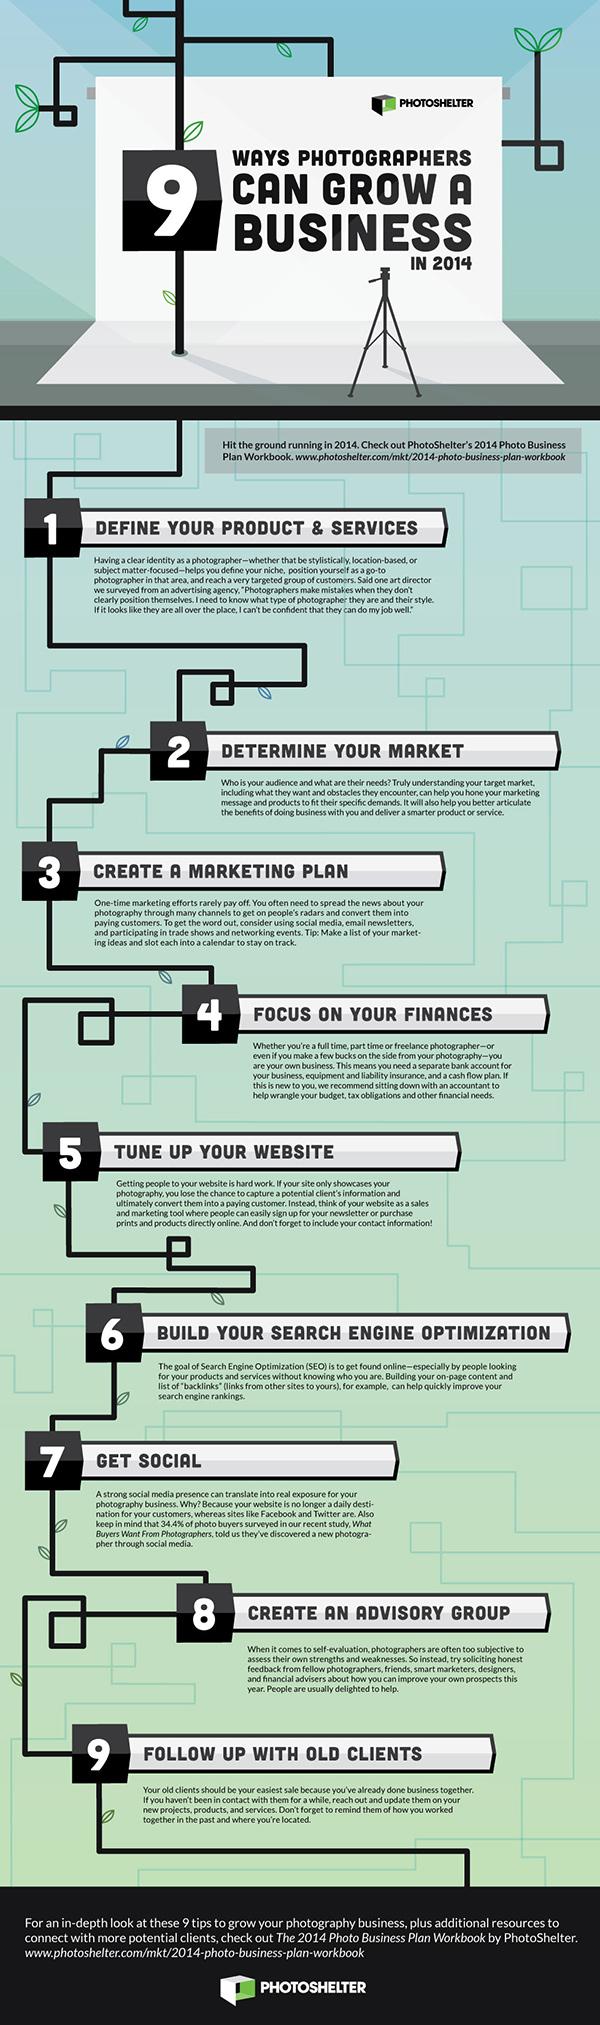 Digital photography business plan